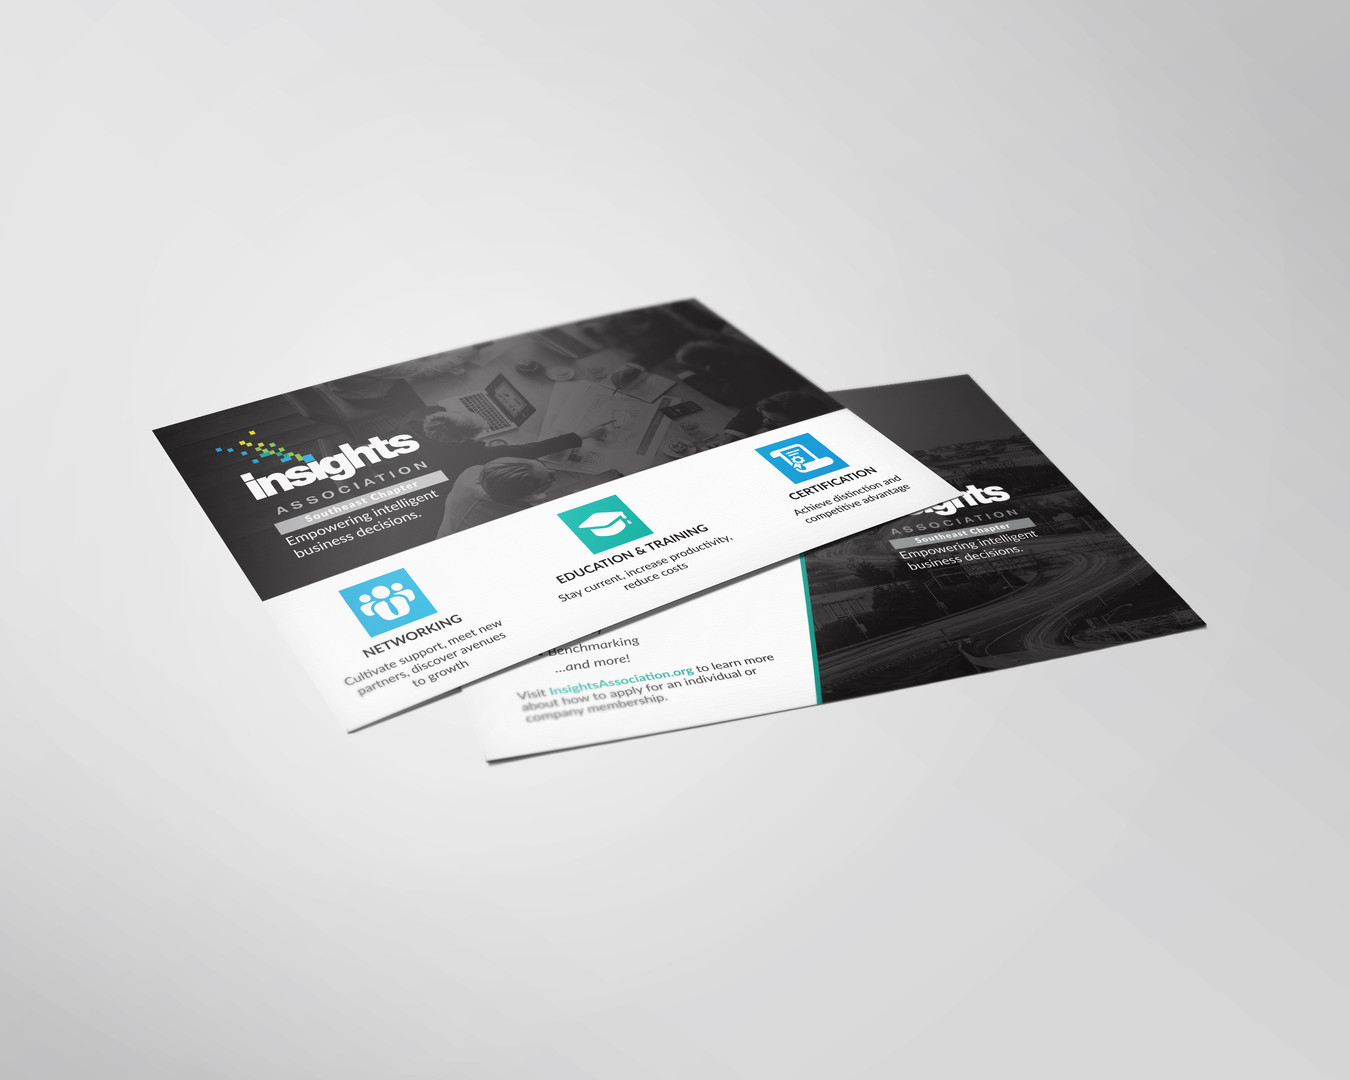 Insights Association Post Card